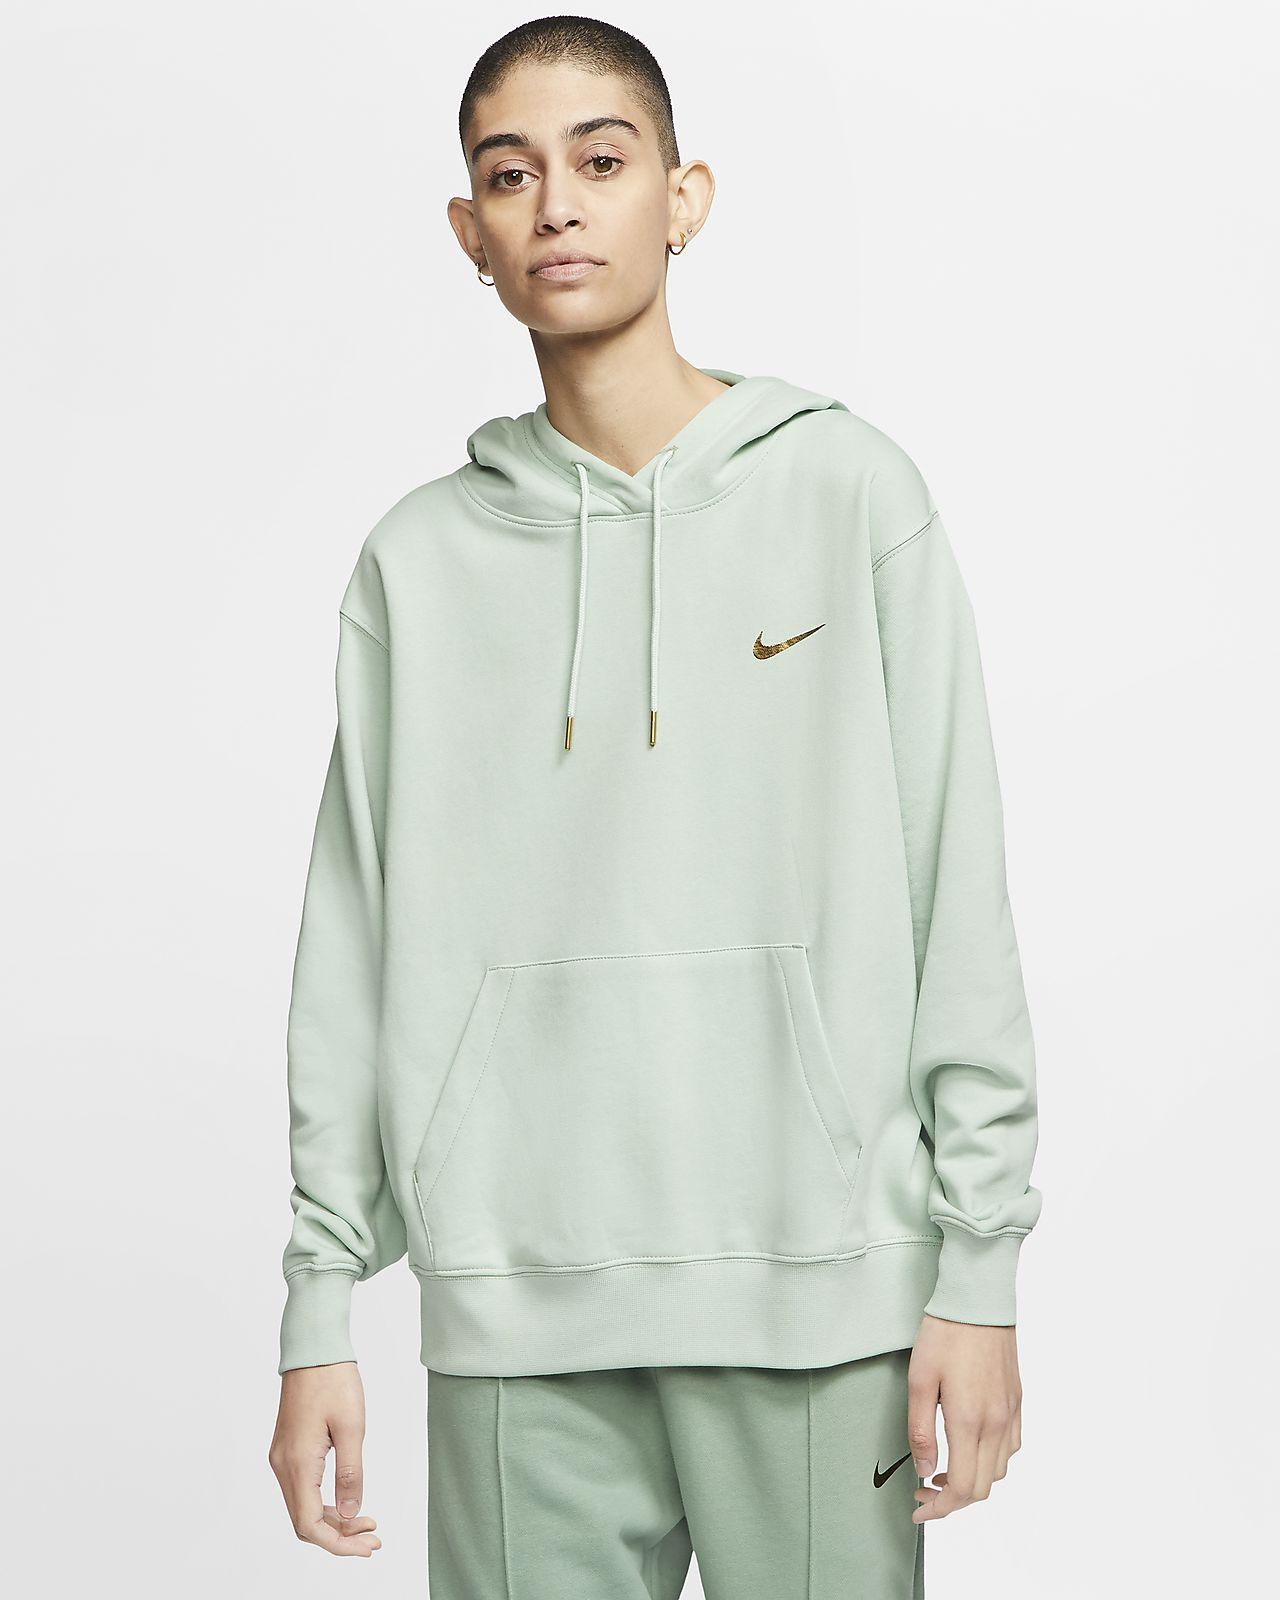 Nike Sportswear Sudadera con capucha Swoosh - Mujer